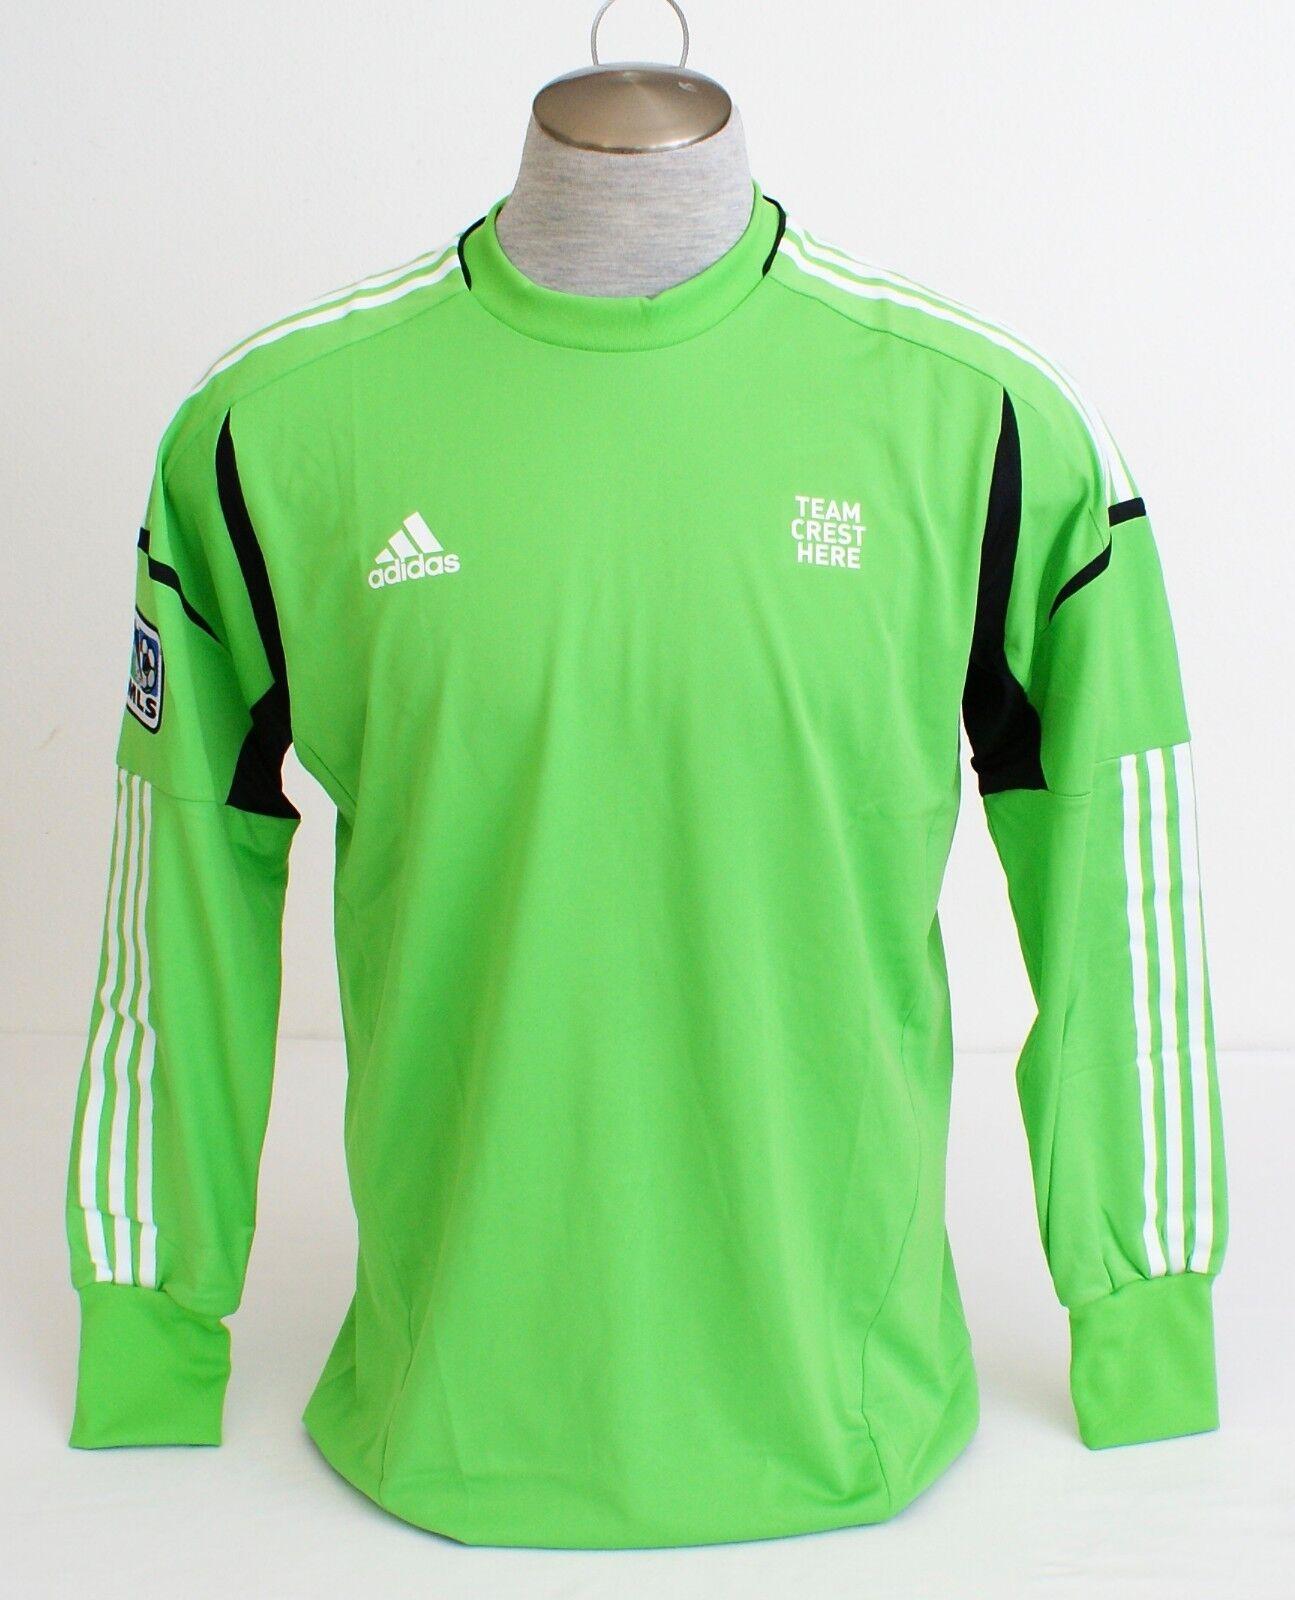 adidas Formotion Goalkeeper MLS Soccer Jersey Men's XL for sale ...